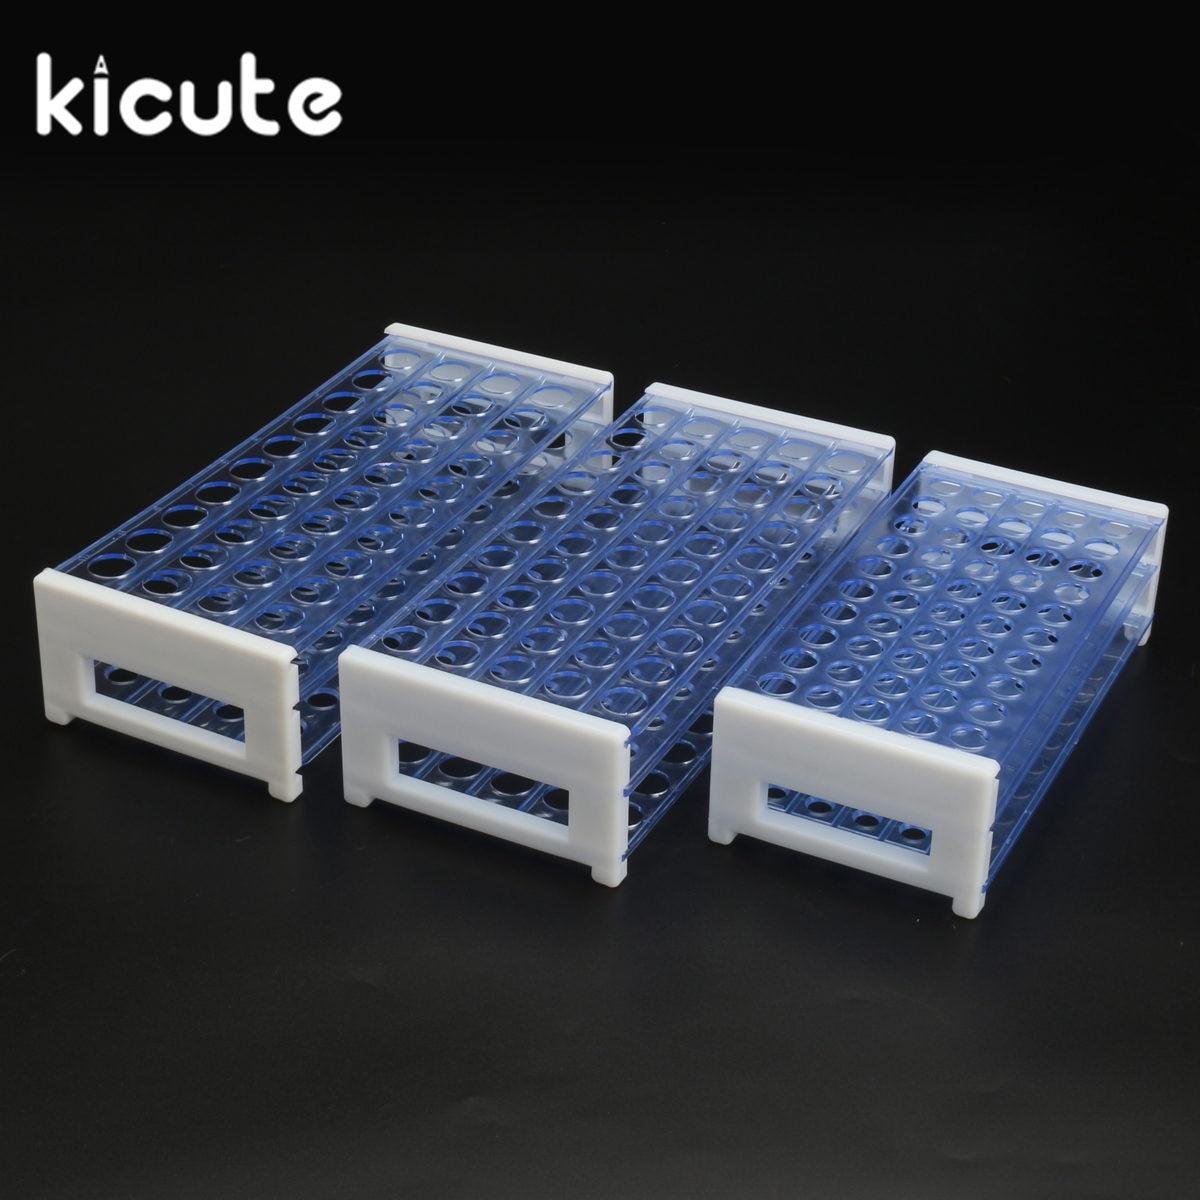 Kicute 1Pcs 13mm 40Hole Plastic Test Tube Rack Holder Support Burette Stand Laboratory Test tube Stand Shelf Lab School Supplies